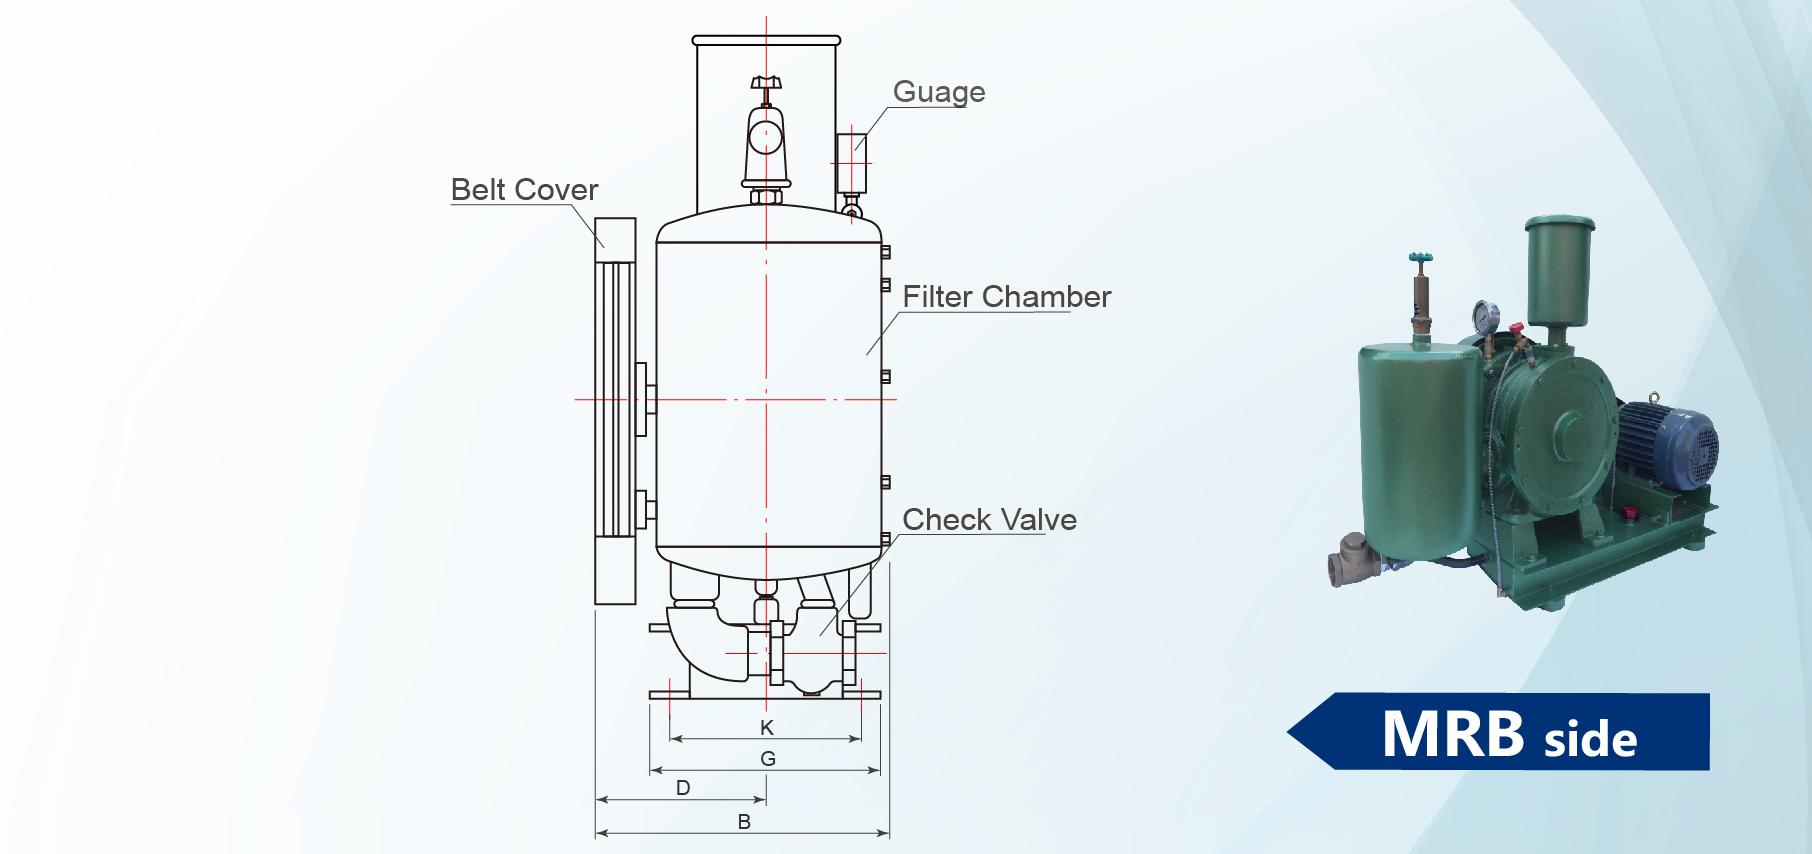 Taiwan Rotary Vane Type Blower Vacuum Pump Sun Mines Electrics Diagram And Factory Site View Blowtac